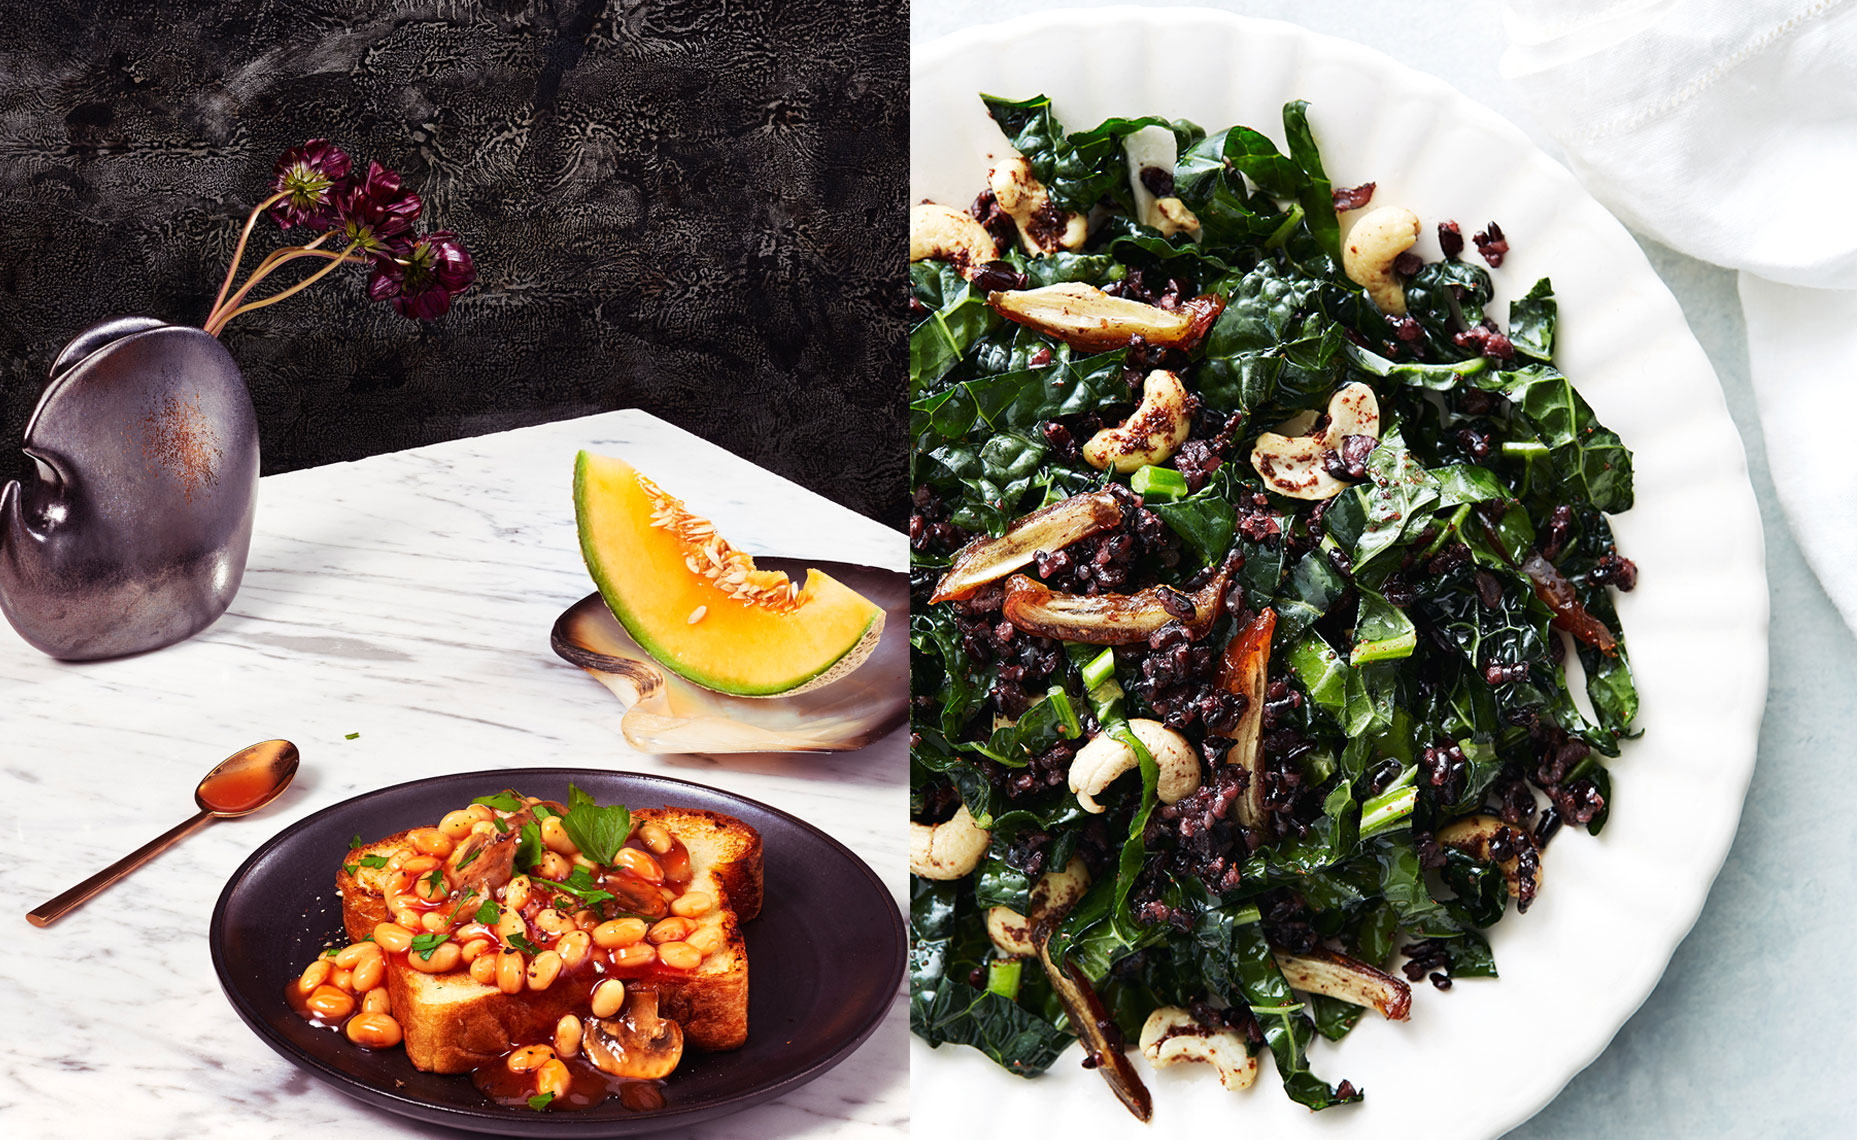 beans-toast-and-kale-salad.jpg